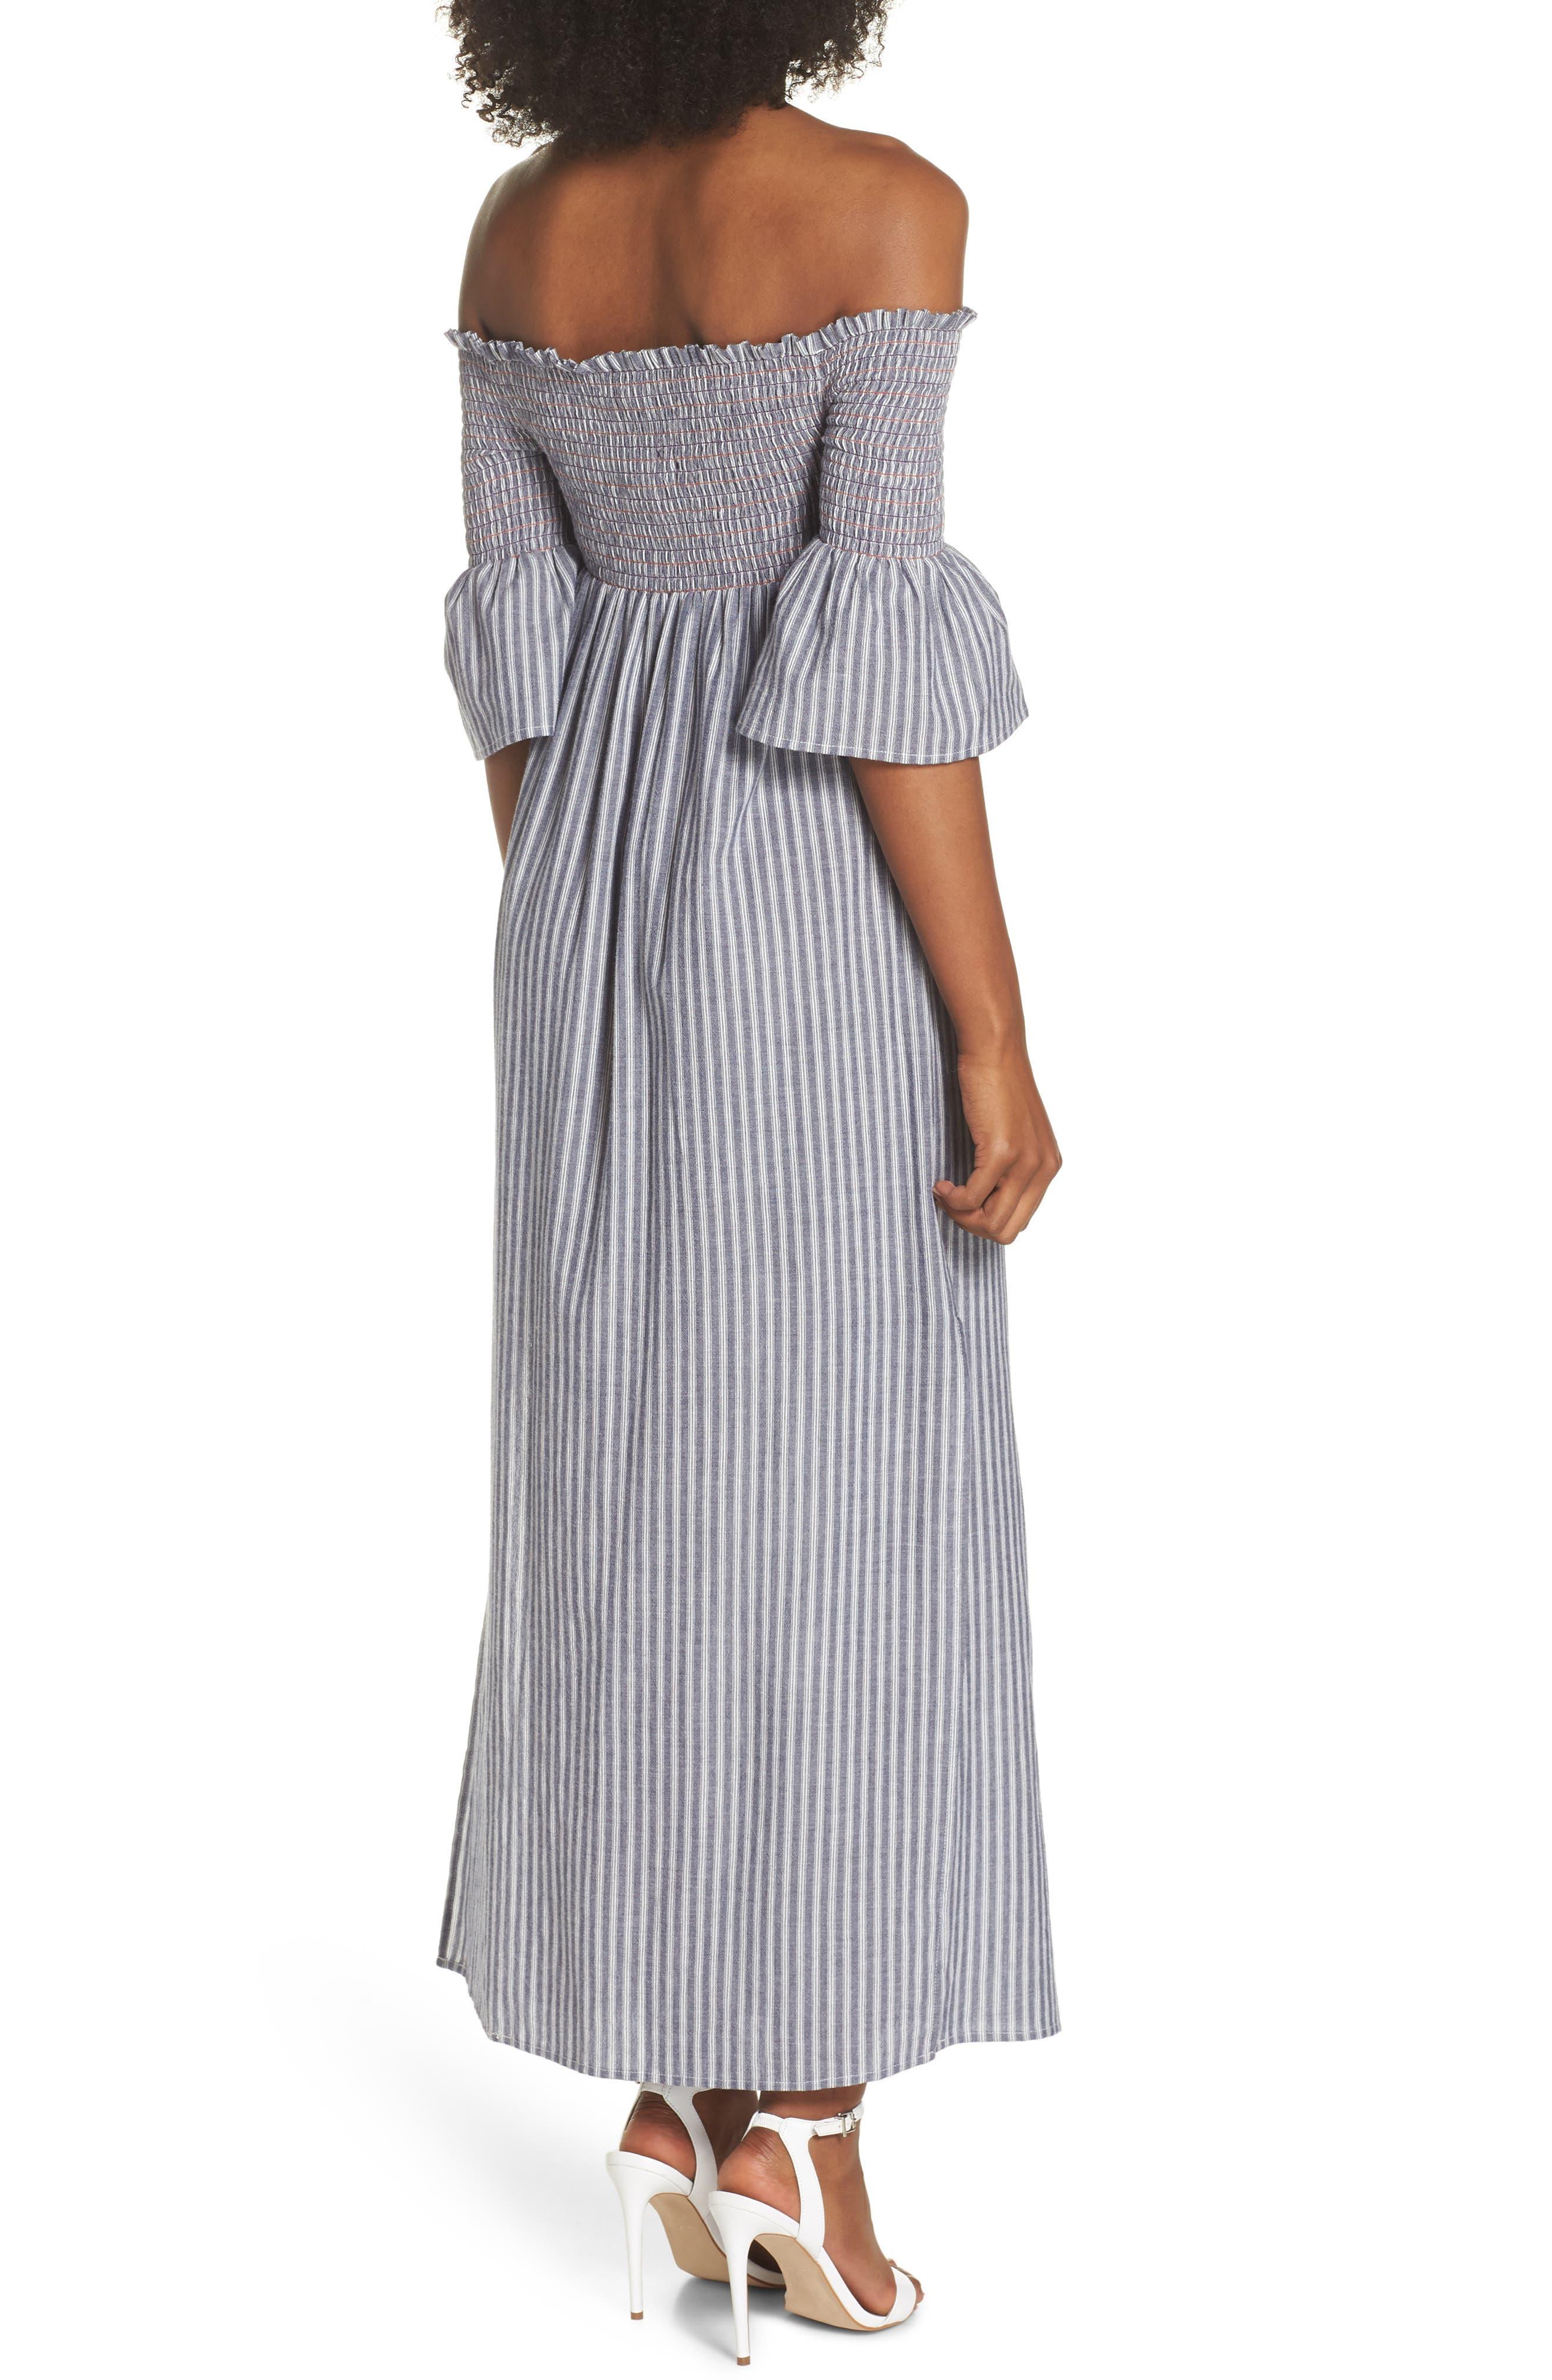 Carmel Smocked Off the Shoulder Maxi Dress,                             Alternate thumbnail 2, color,                             Chambray